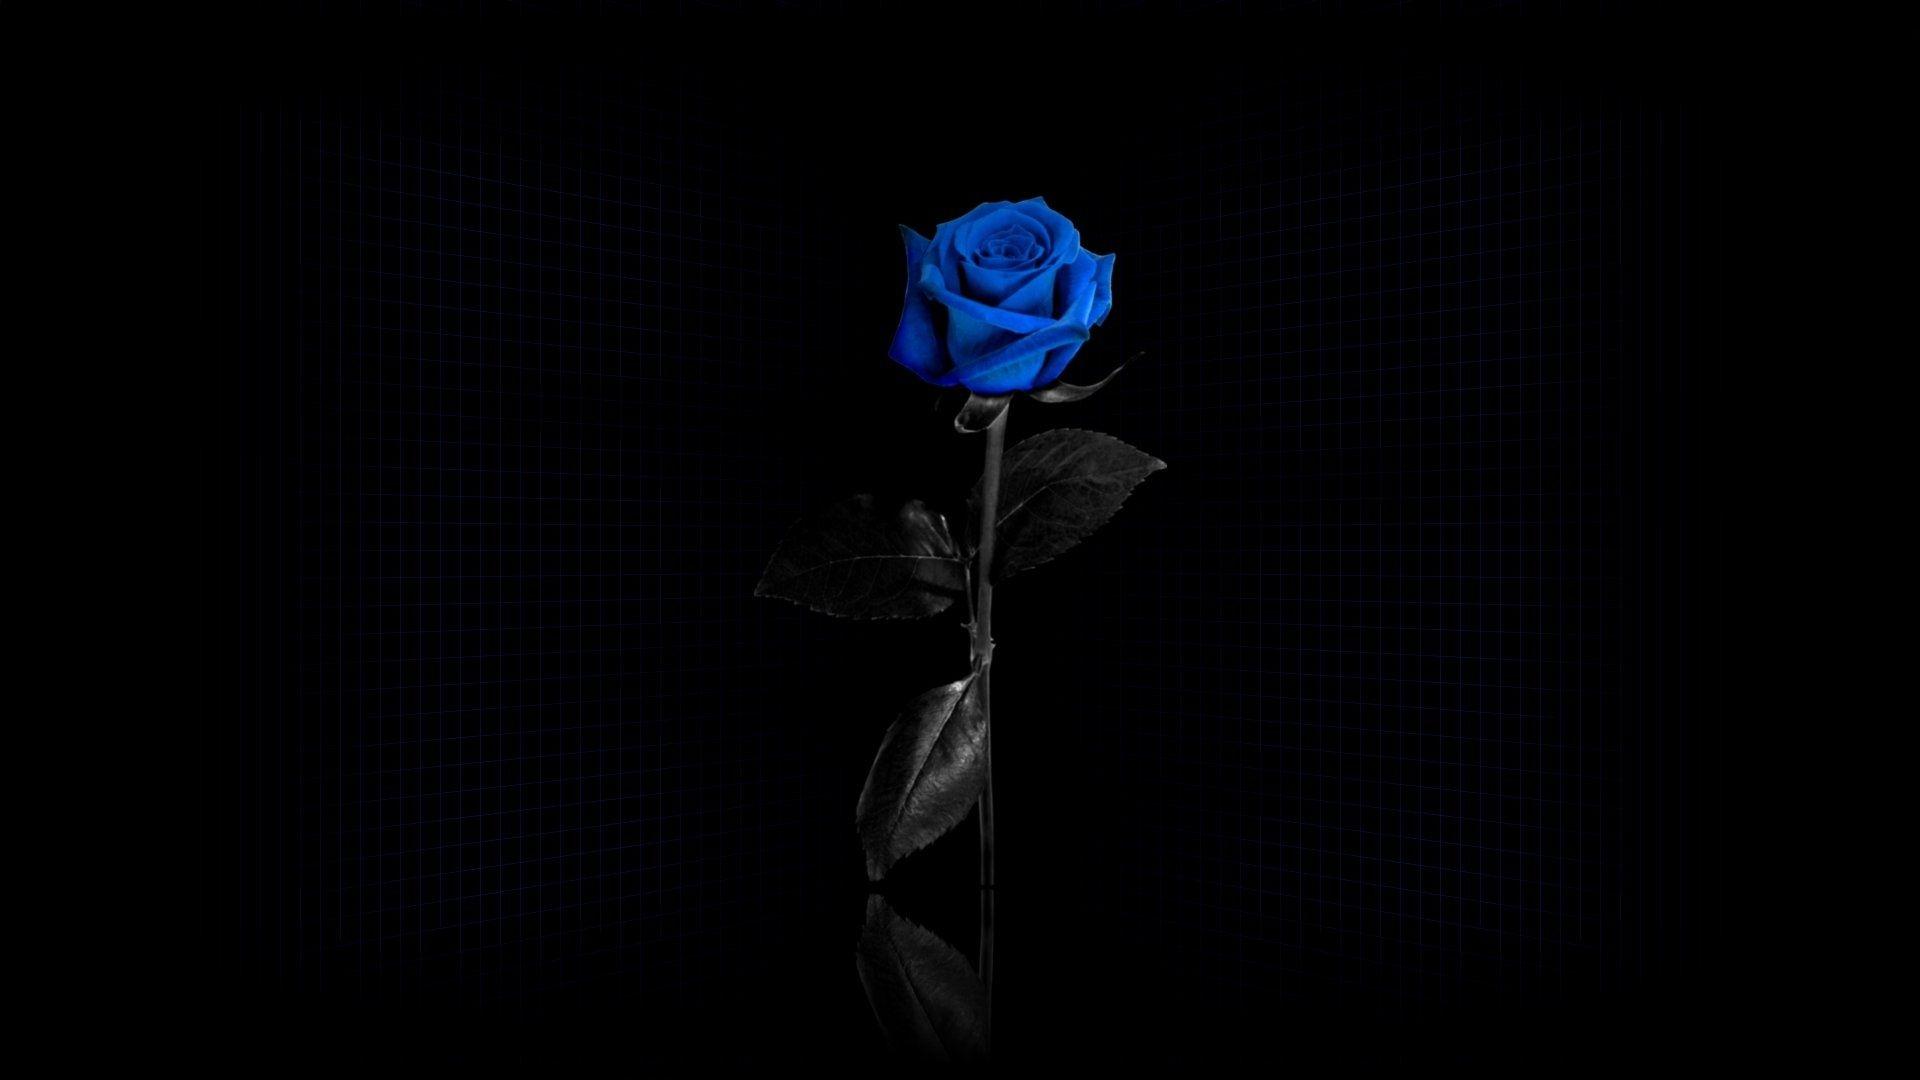 Beautiful Blue Rose On Black Background Blue Roses Wallpaper Rose Wallpaper Blue Rose Wallpaper